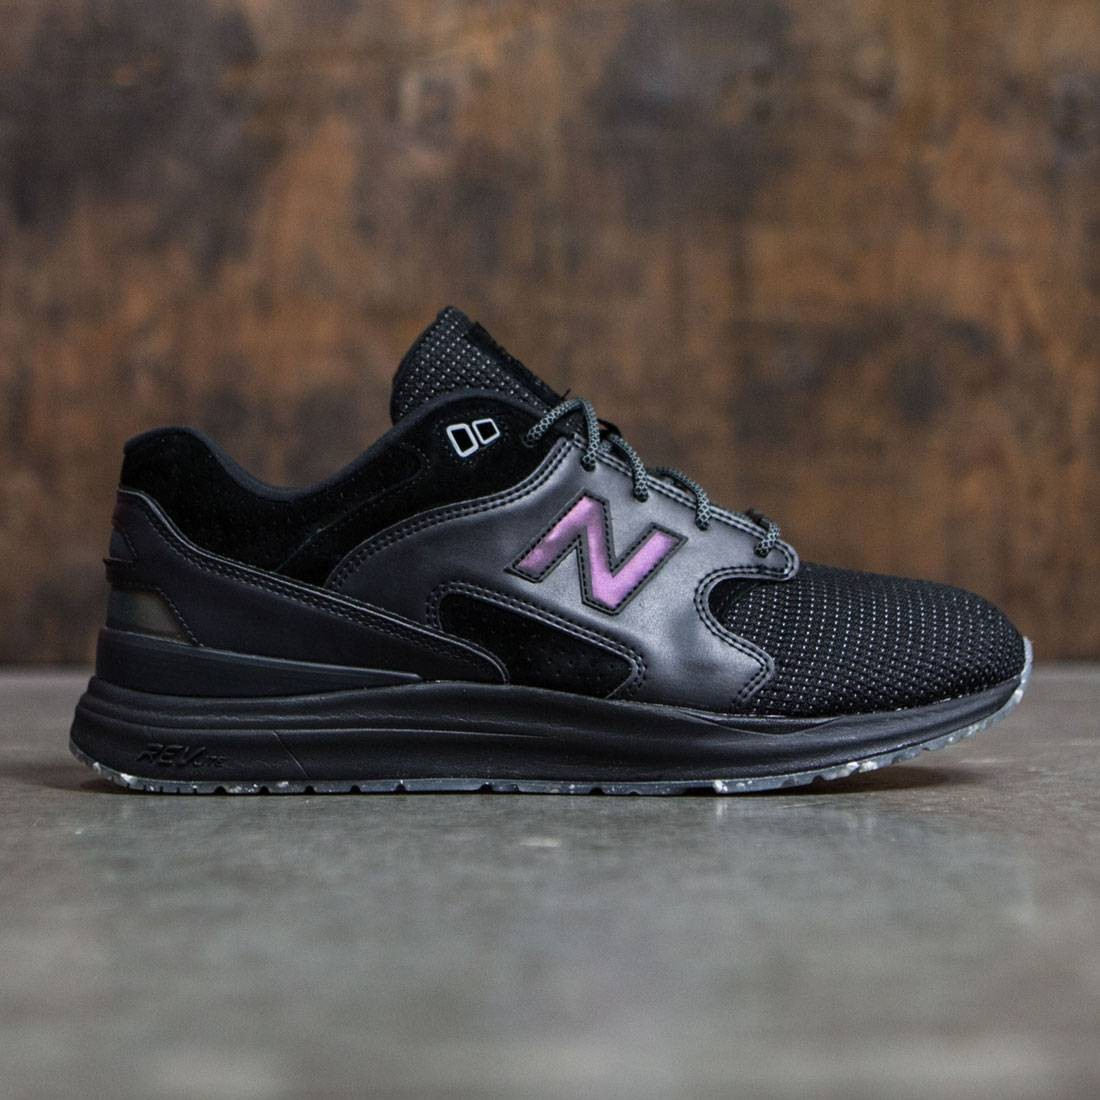 New Balance 1550 Especial